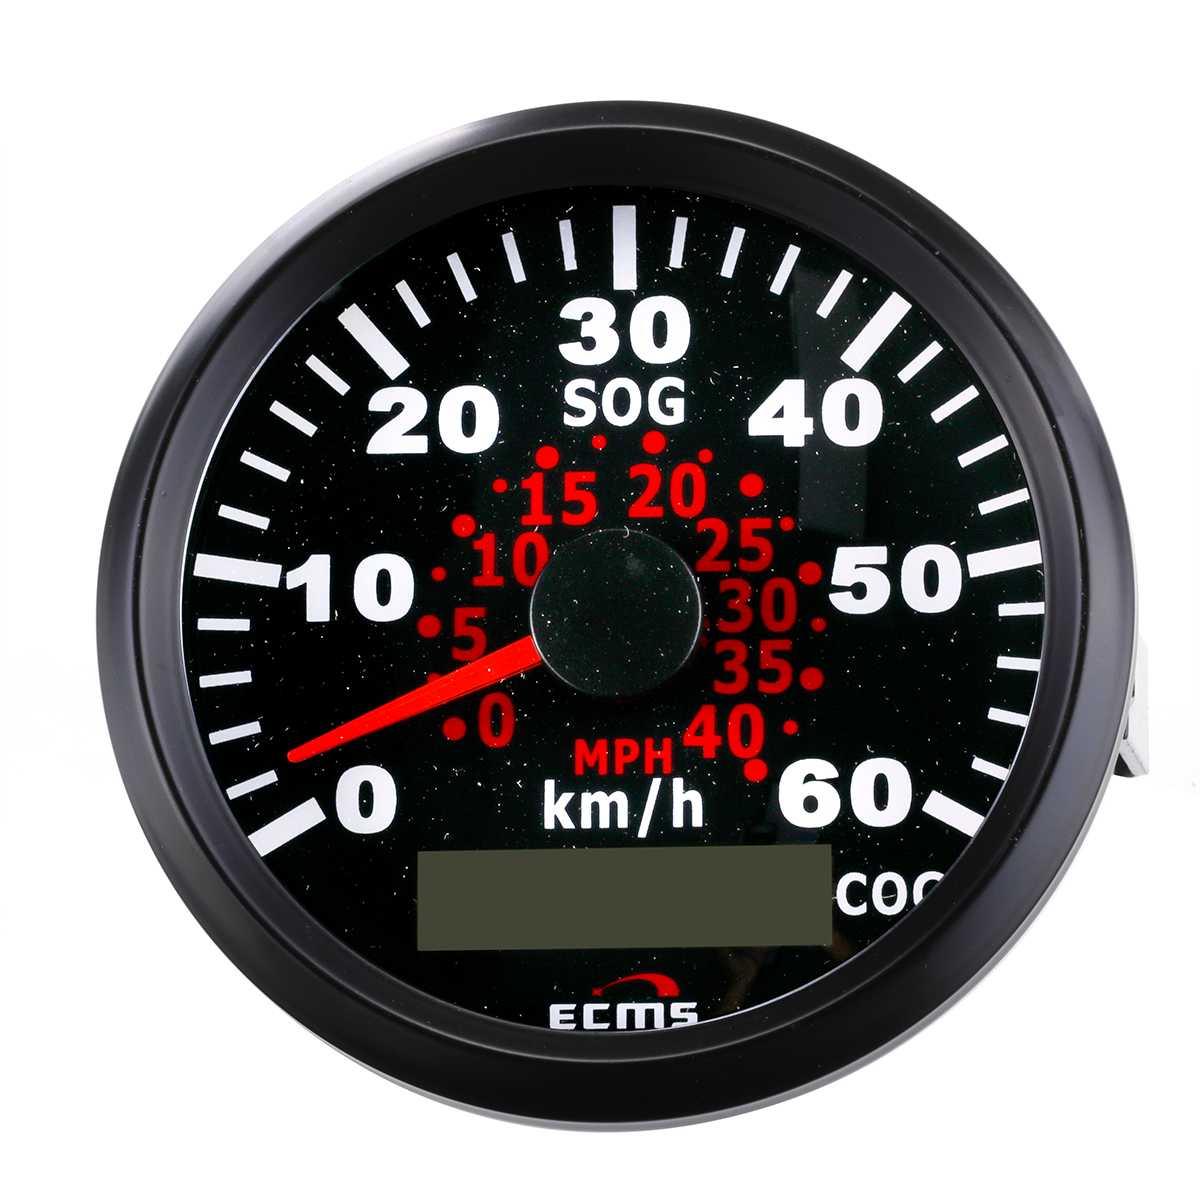 85mm Auto Car Truck Marine GPS Speedometer Waterproof Speed Sensor Meter Gauge Digital Odometer Automobiles Replacement Parts 5